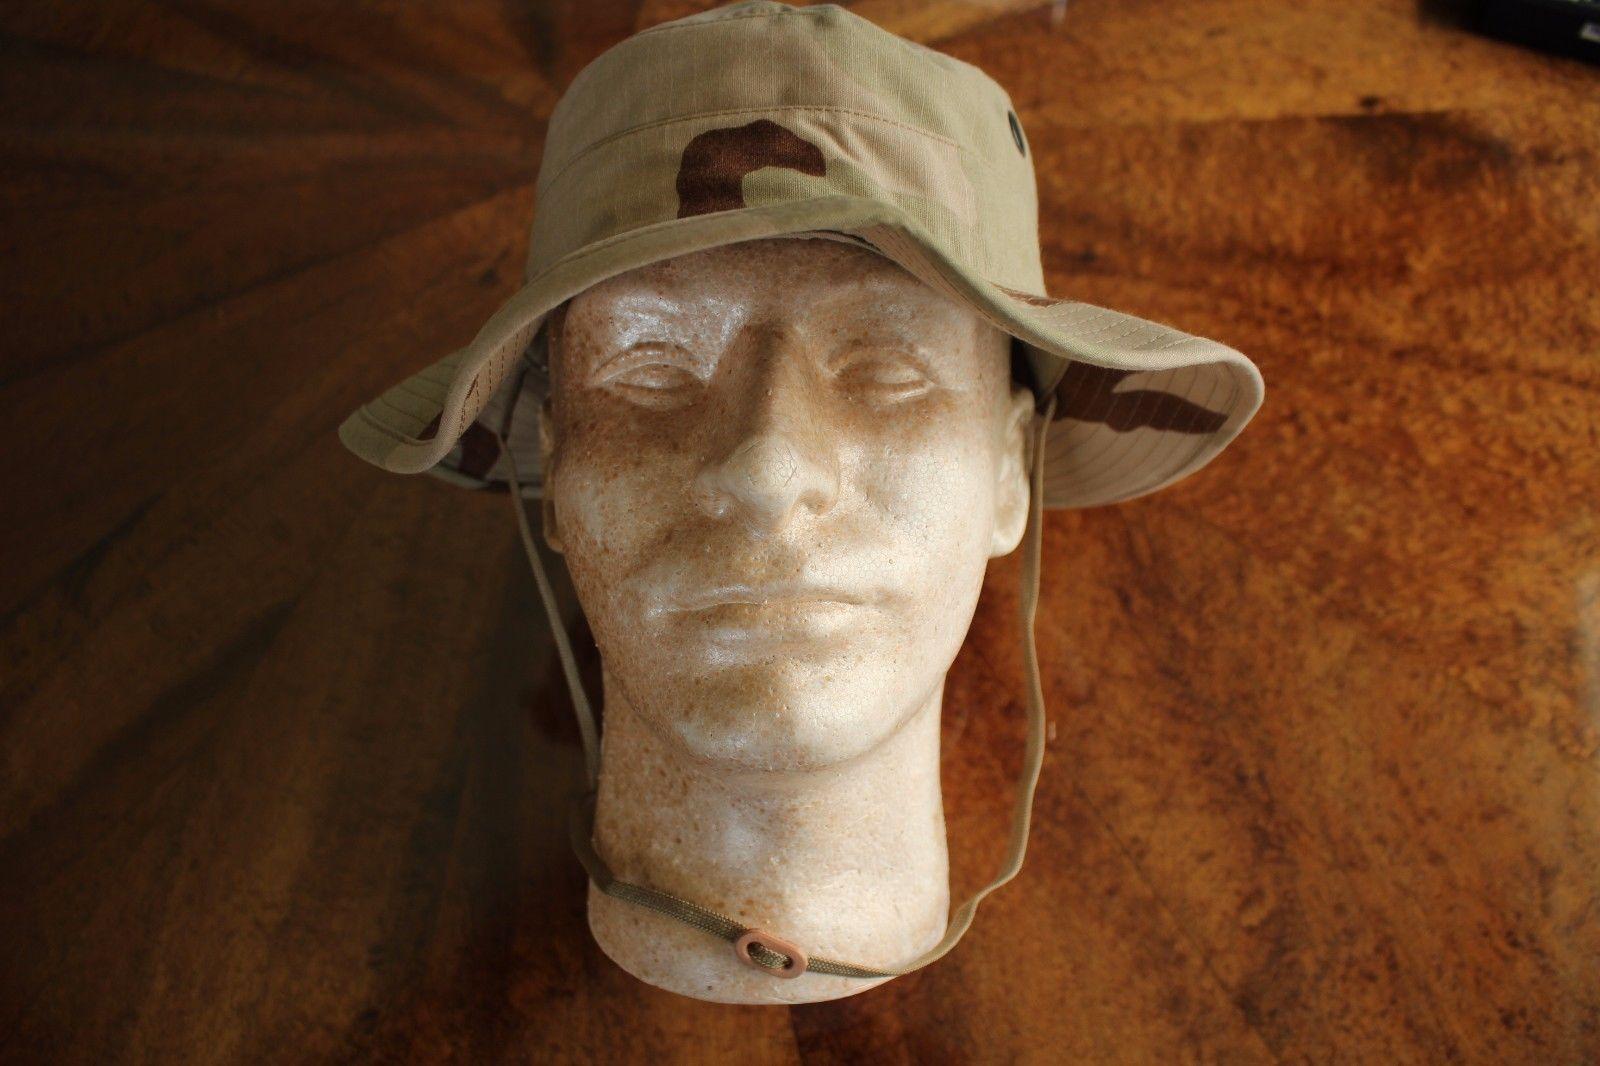 USMC MARINE CORPS GRN MARPAT TWILL CAMOUFLAGE COMBAT FLOPPY HAT BOONIE CAP 7 1//2